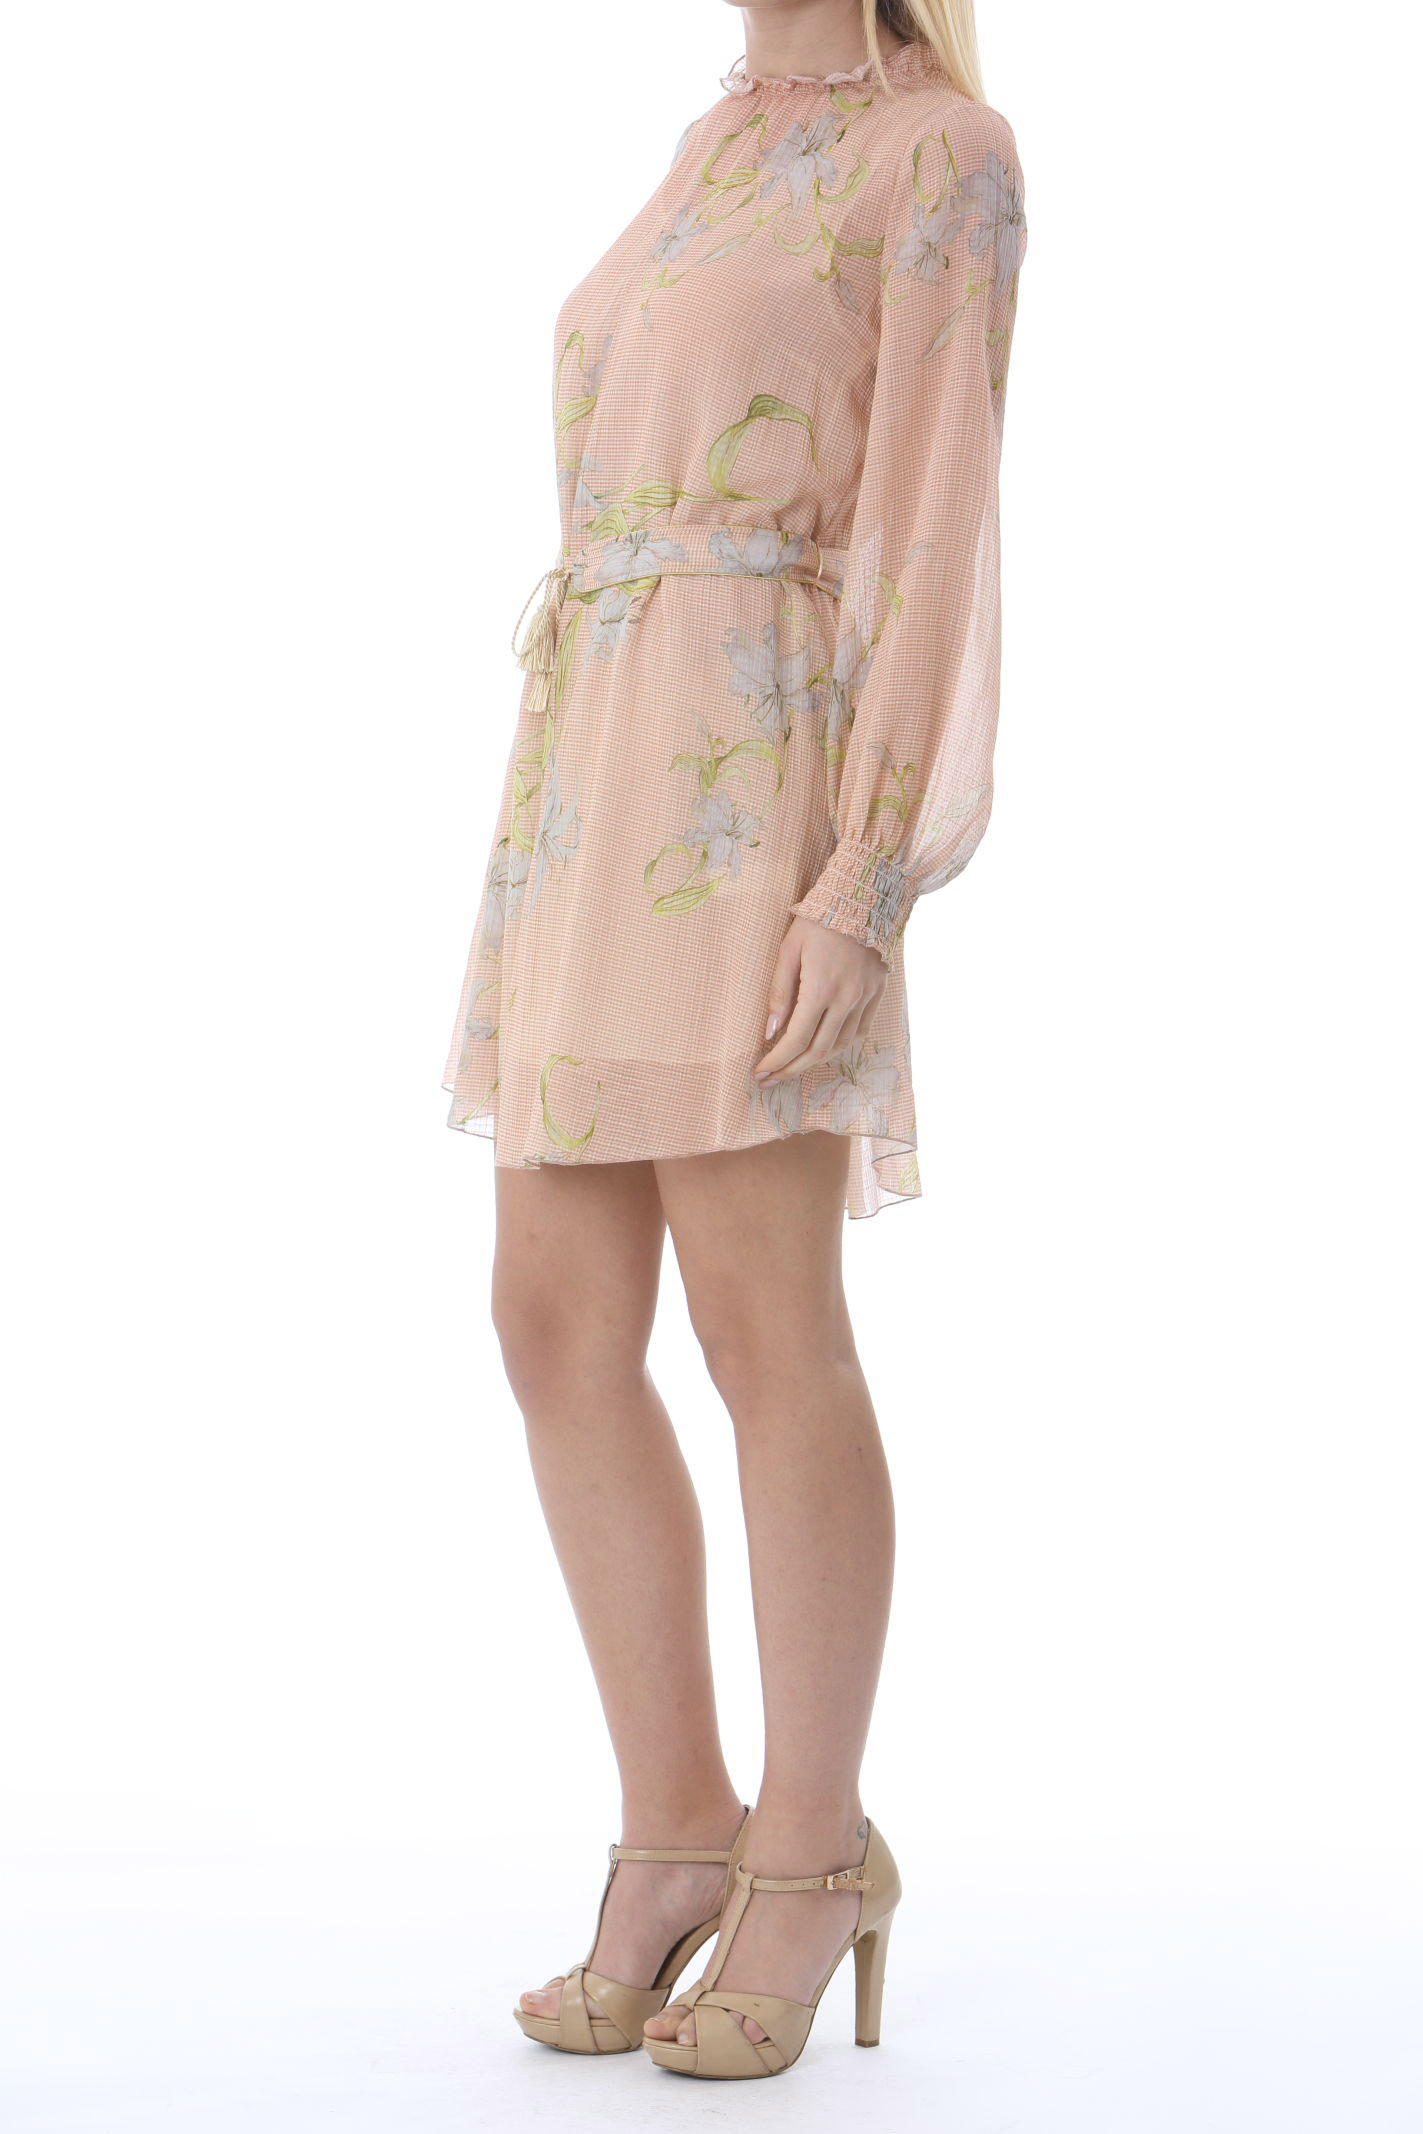 GIULIETTA PRINT COTTONSILK CREPPONE VOILE SHORT DRESS FORTE FORTE | Abiti | 8091MYDRESS2005